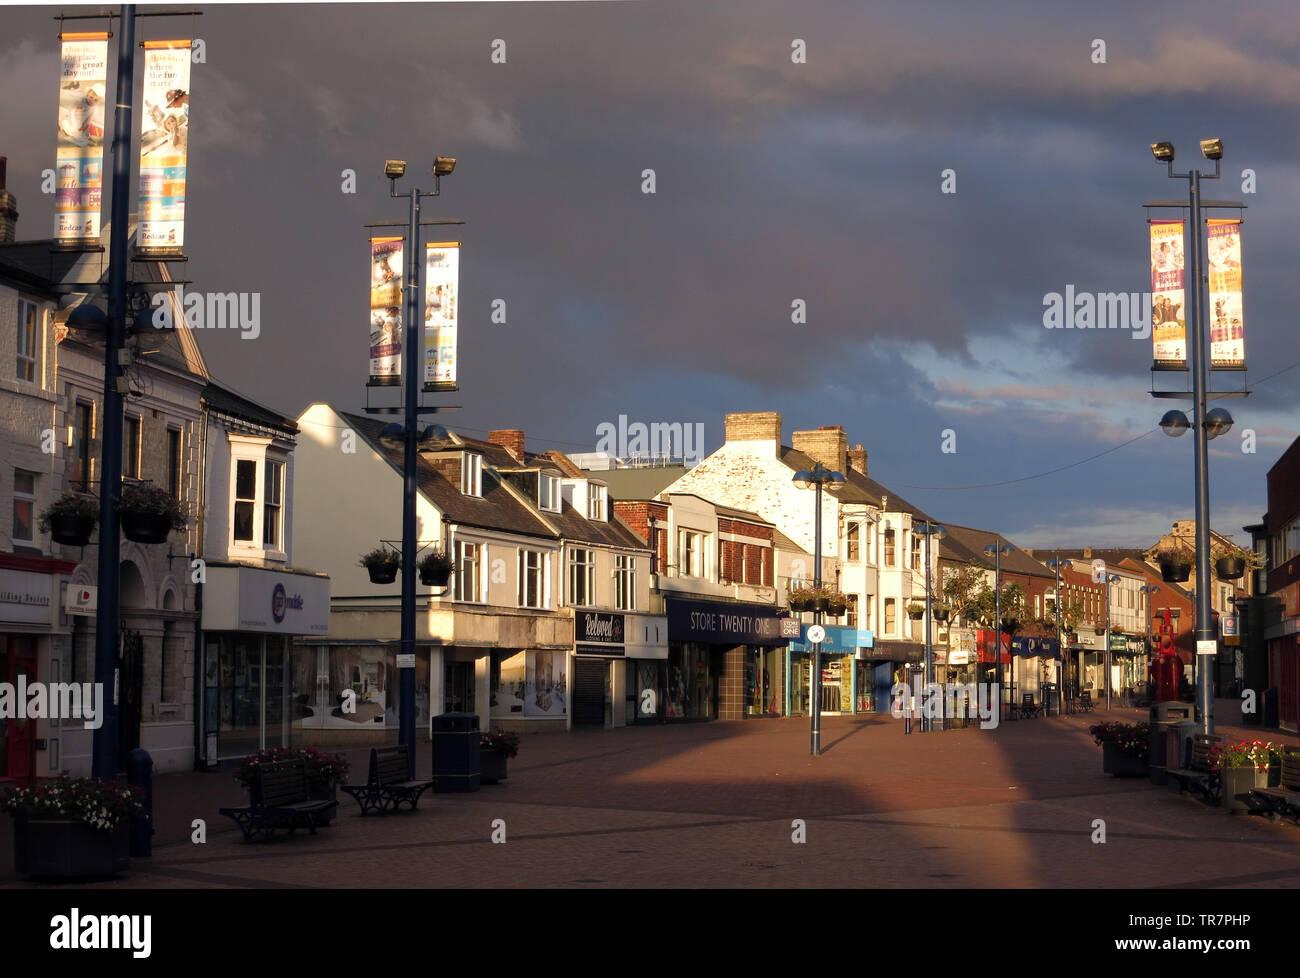 Redcar, Cleveland, England, Britain - Stock Image